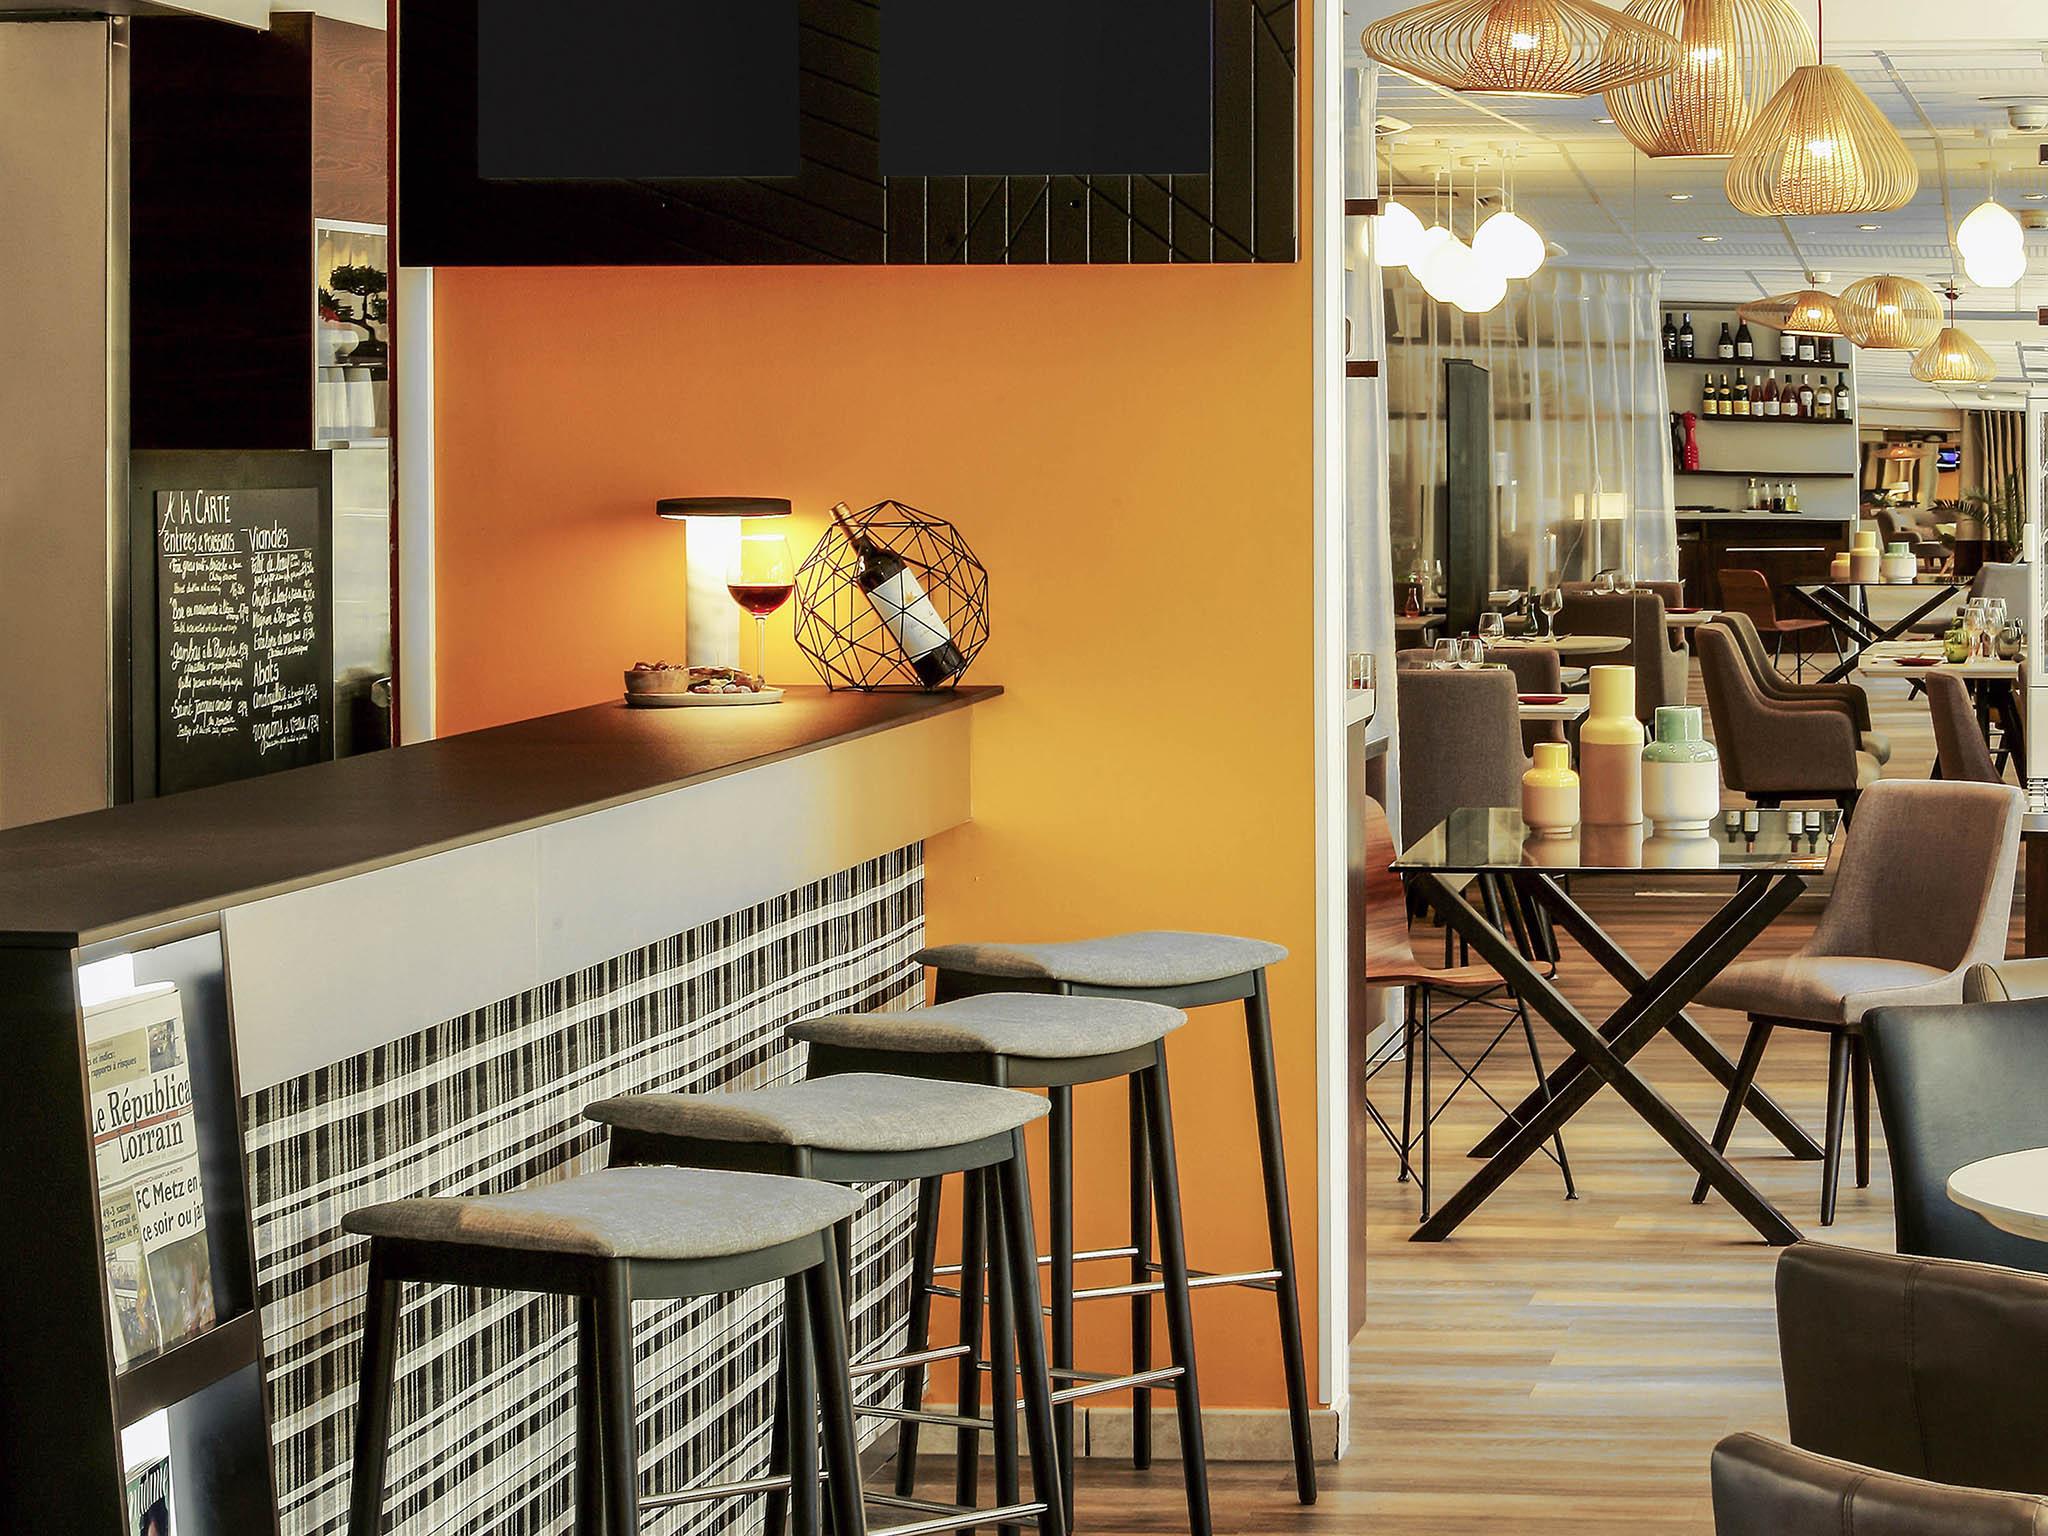 1976_ba_00_p_2048x1536 Incroyable De Table Bar Cuisine Conception